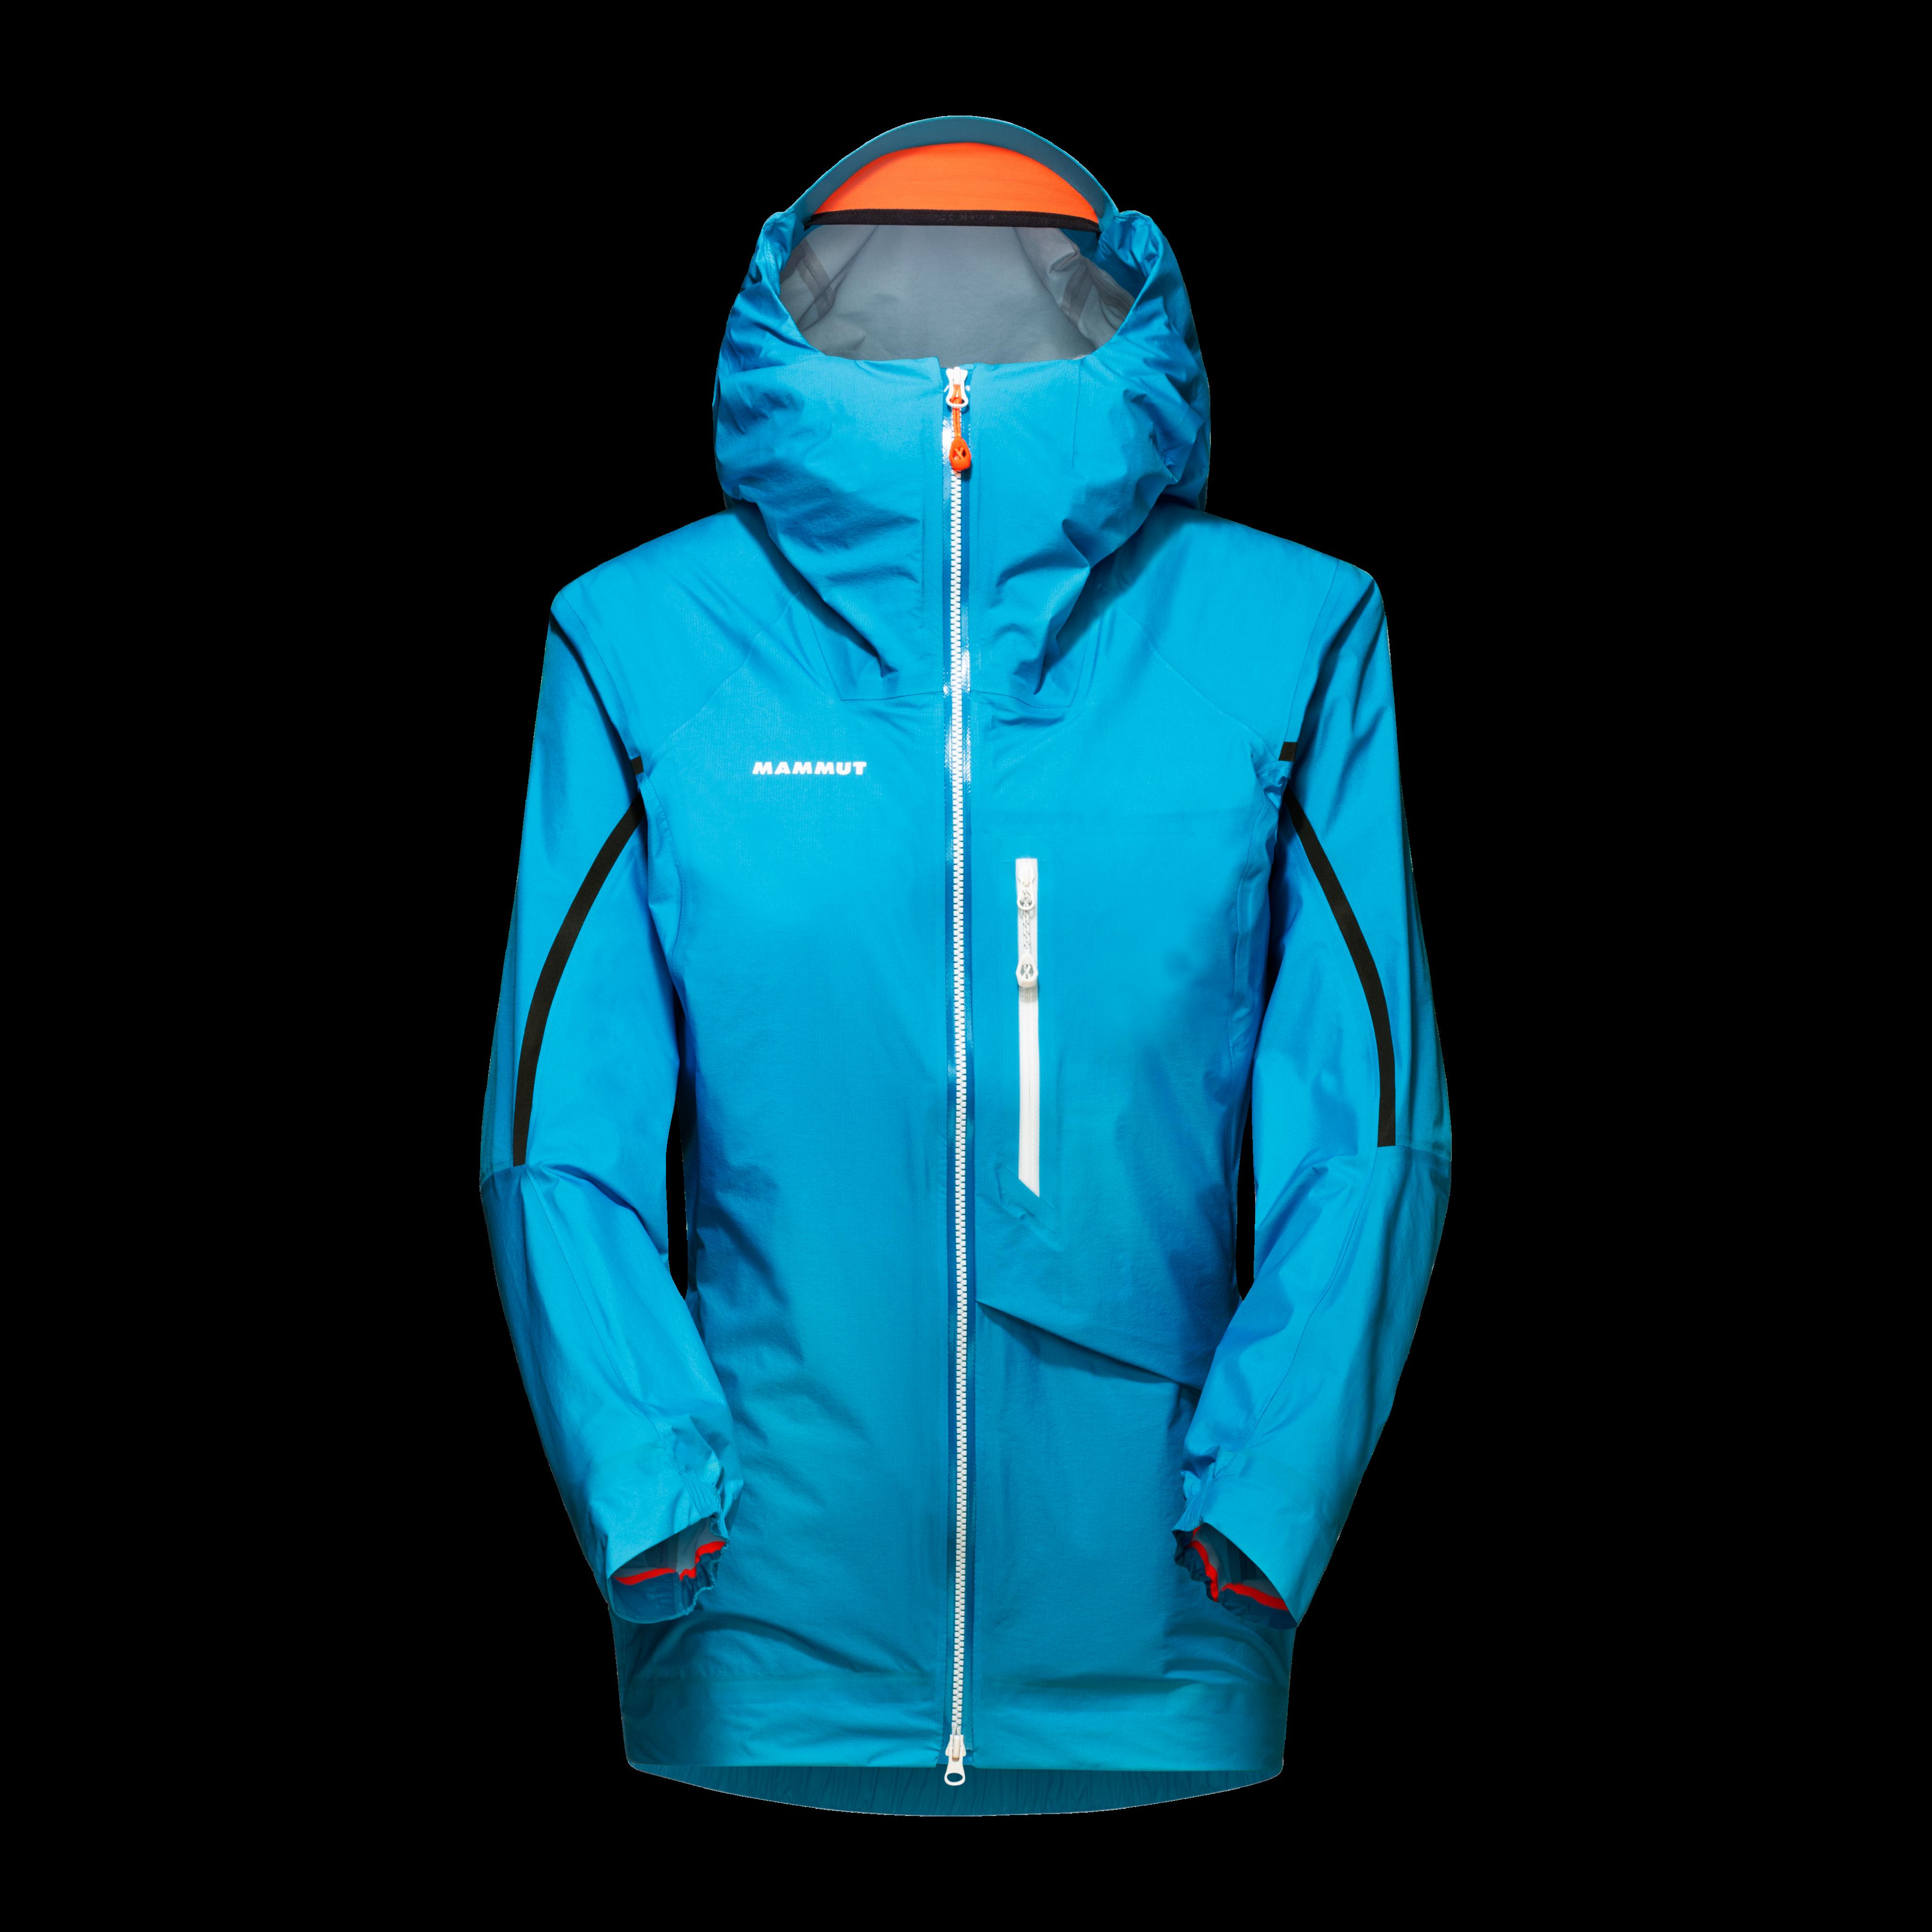 Nordwand Light HS Hooded Jacket Women - M, sky thumbnail